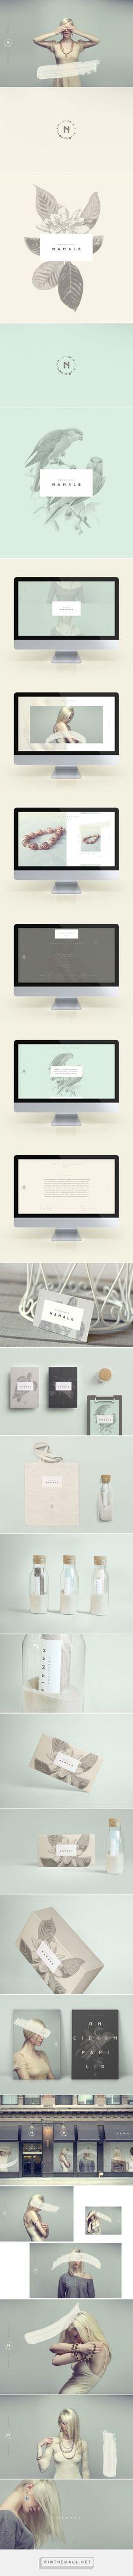 Créations Namale Branding by Phoenix the Creative Studio on Behance Corporate Branding, Logo Branding, Branding Agency, Graphic Design Branding, Corporate Design, Identity Design, Visual Identity, Packaging Design, Brand Identity